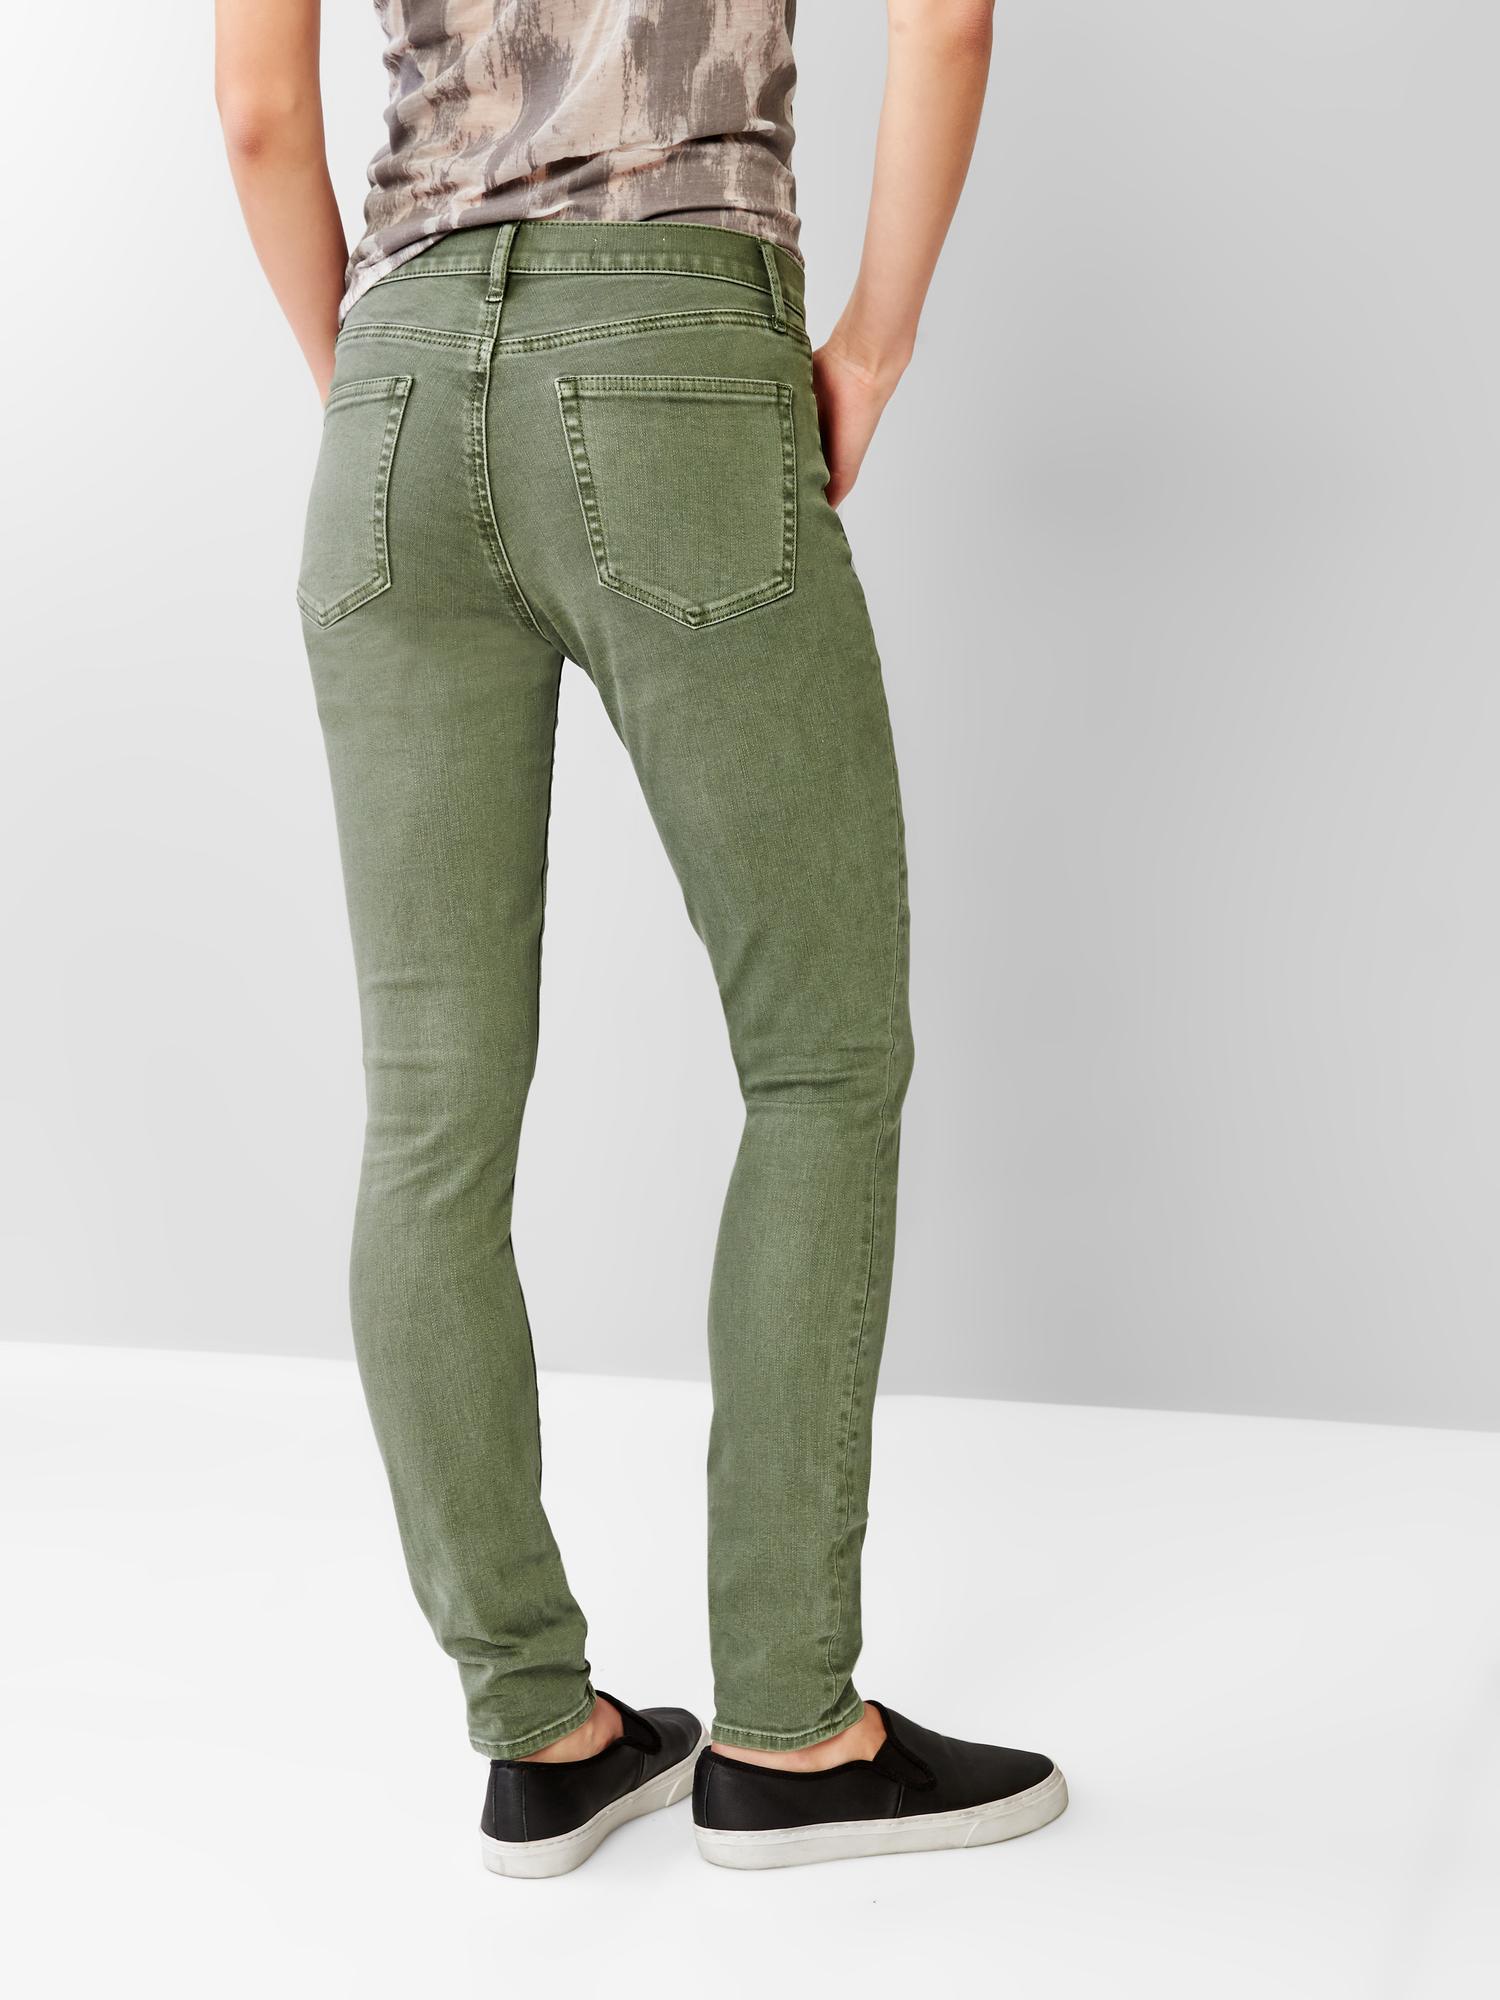 Gap 1969 Resolution True Skinny Jeans In Green Vintage